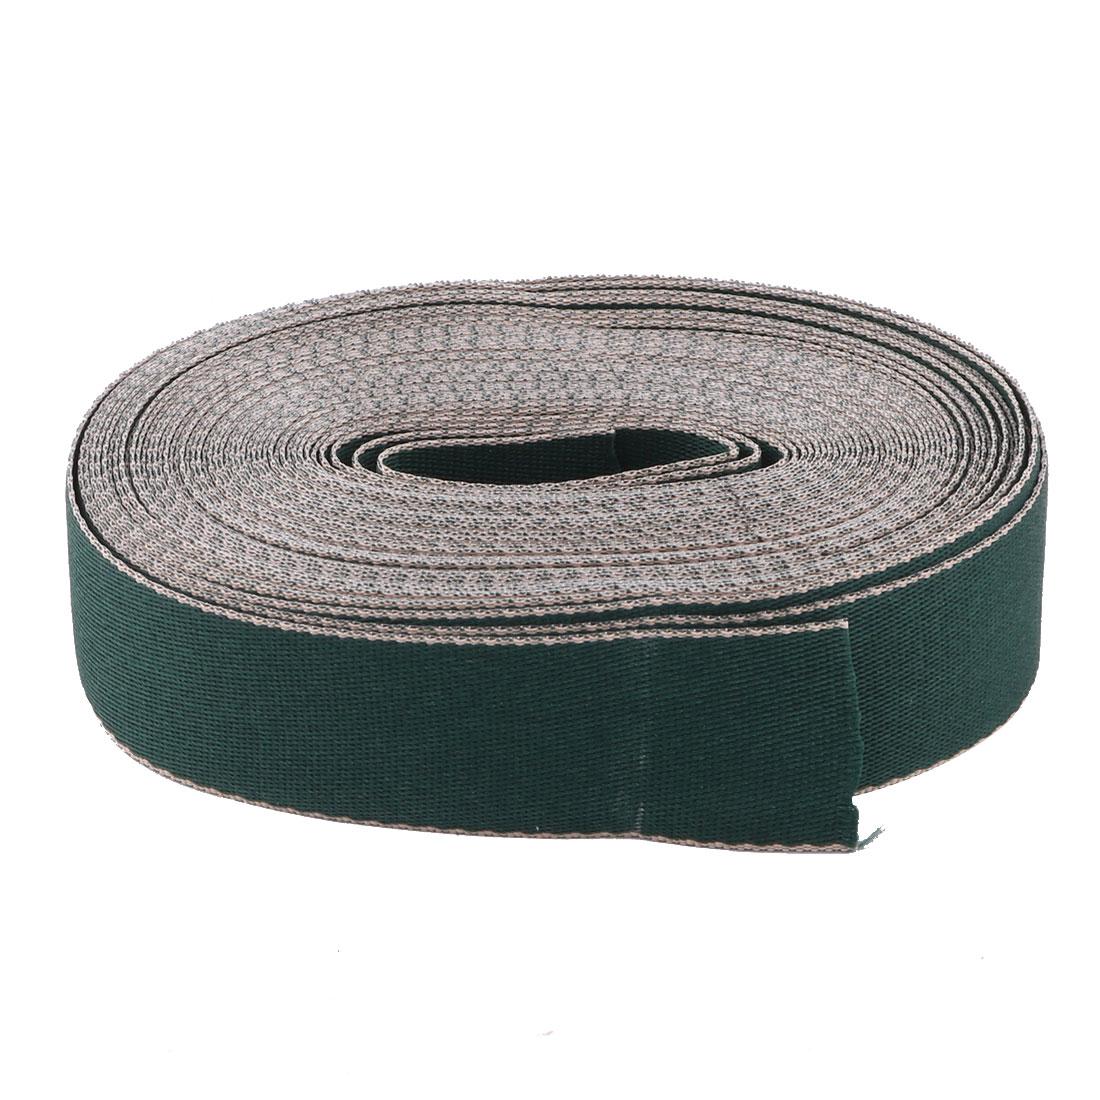 Cotton Blends Trim Ties Headbands Decor Craft Ribbon Dark Green 10 Yards